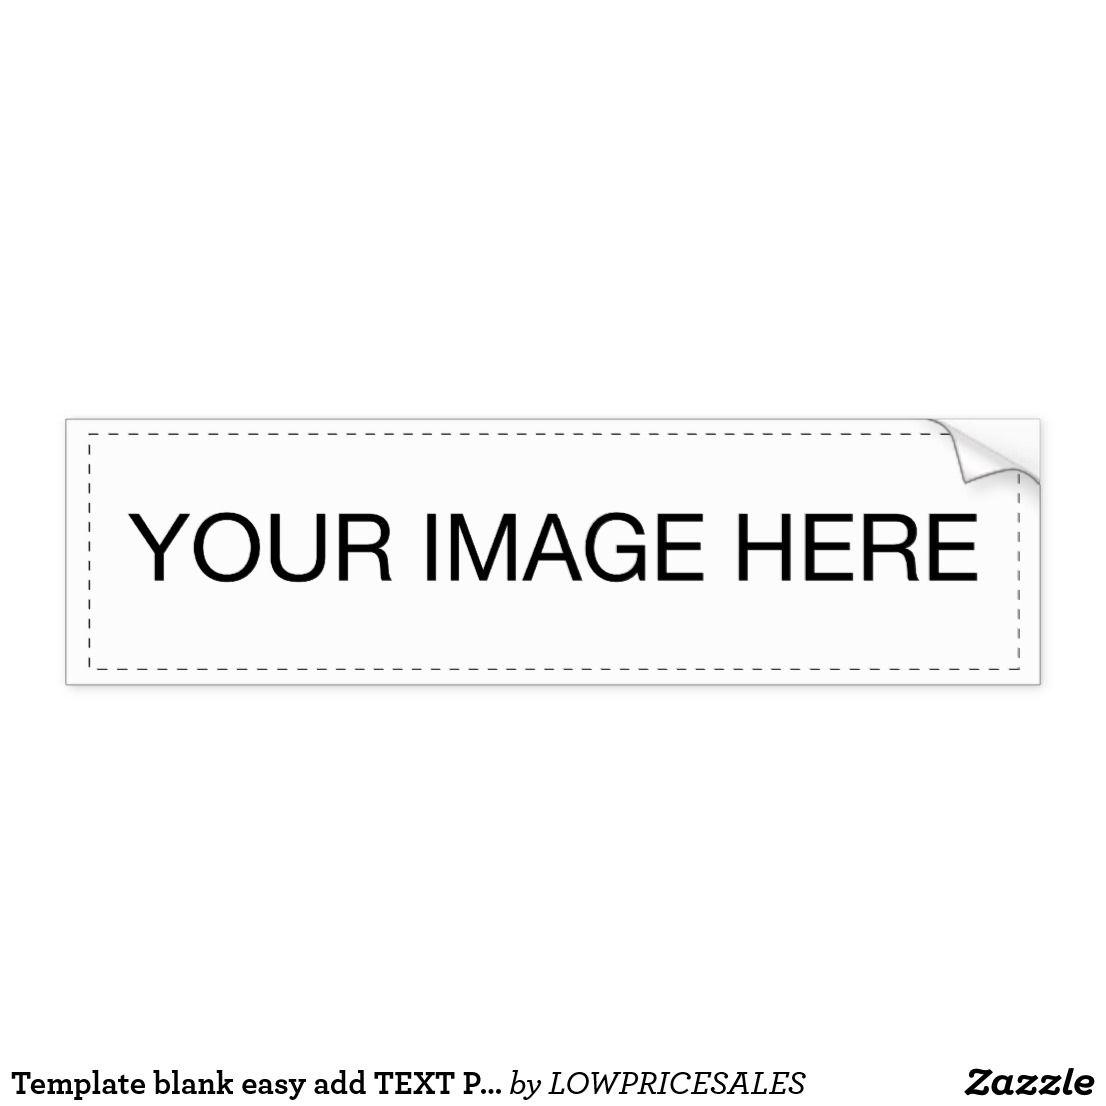 Template Blank Easy Add Text Photo Jpg Image Fun Bumper Sticker Zazzle Com Bumper Stickers Image Fun Customized Gifts [ 1106 x 1106 Pixel ]